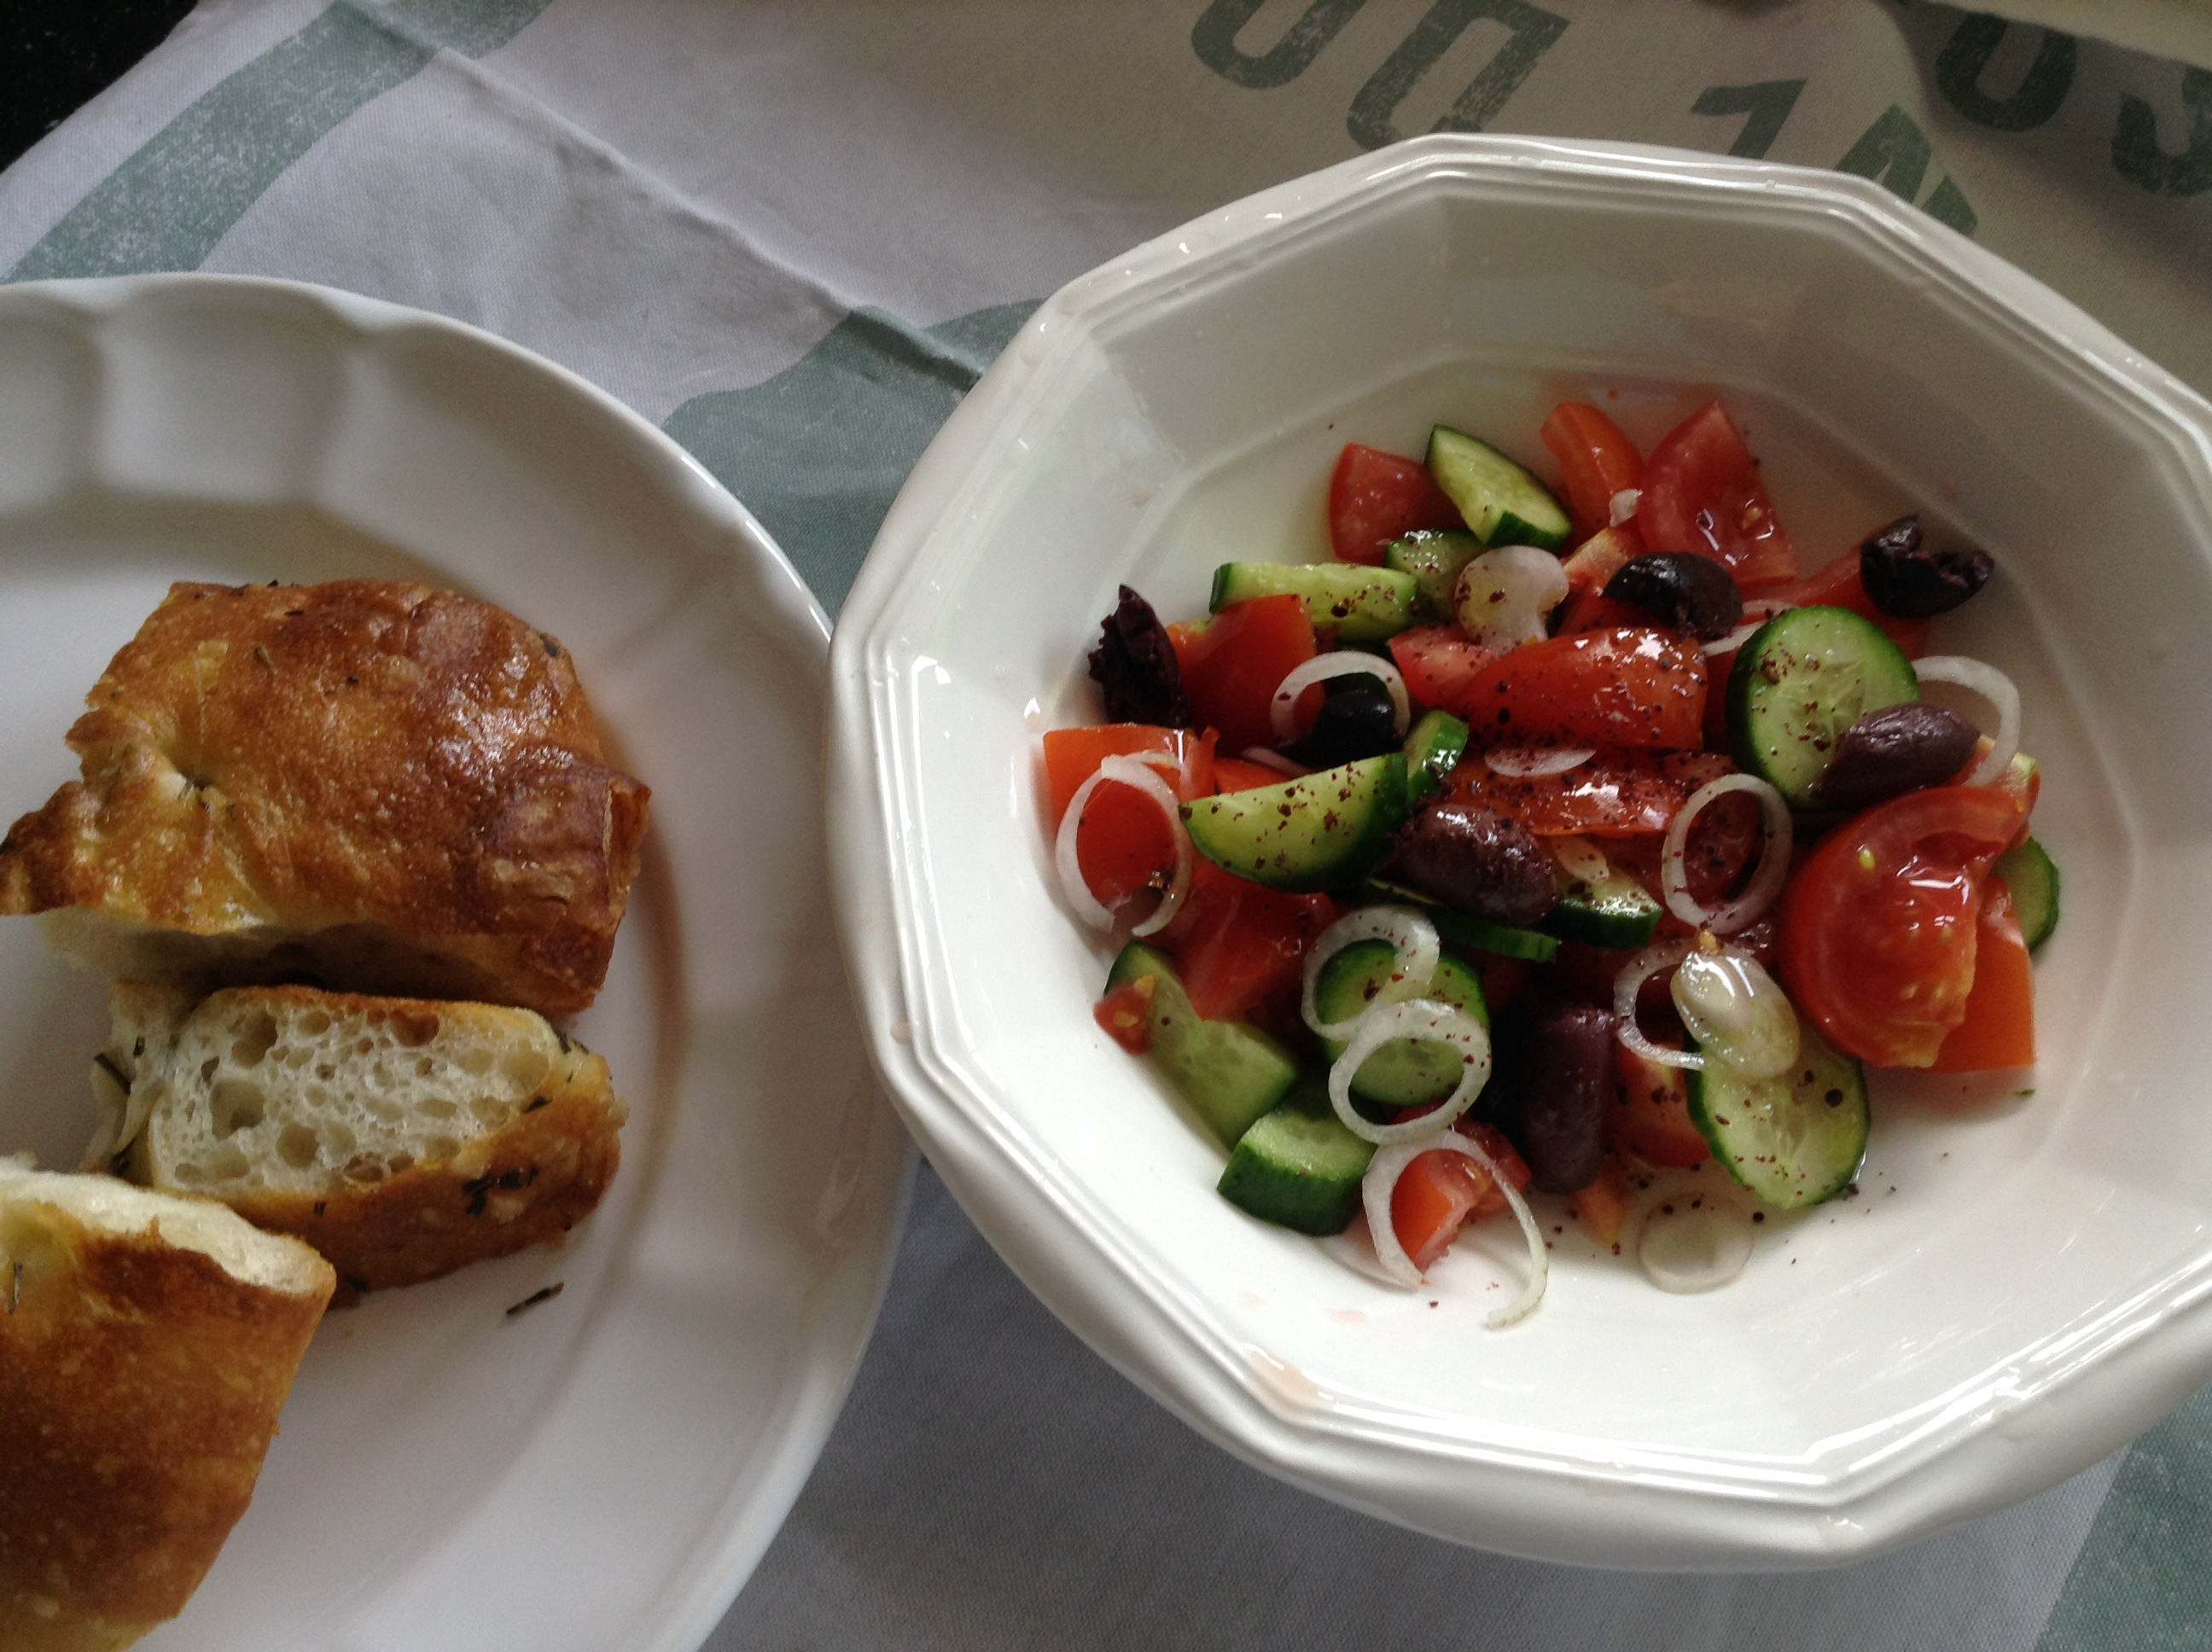 Sumac Greek salad